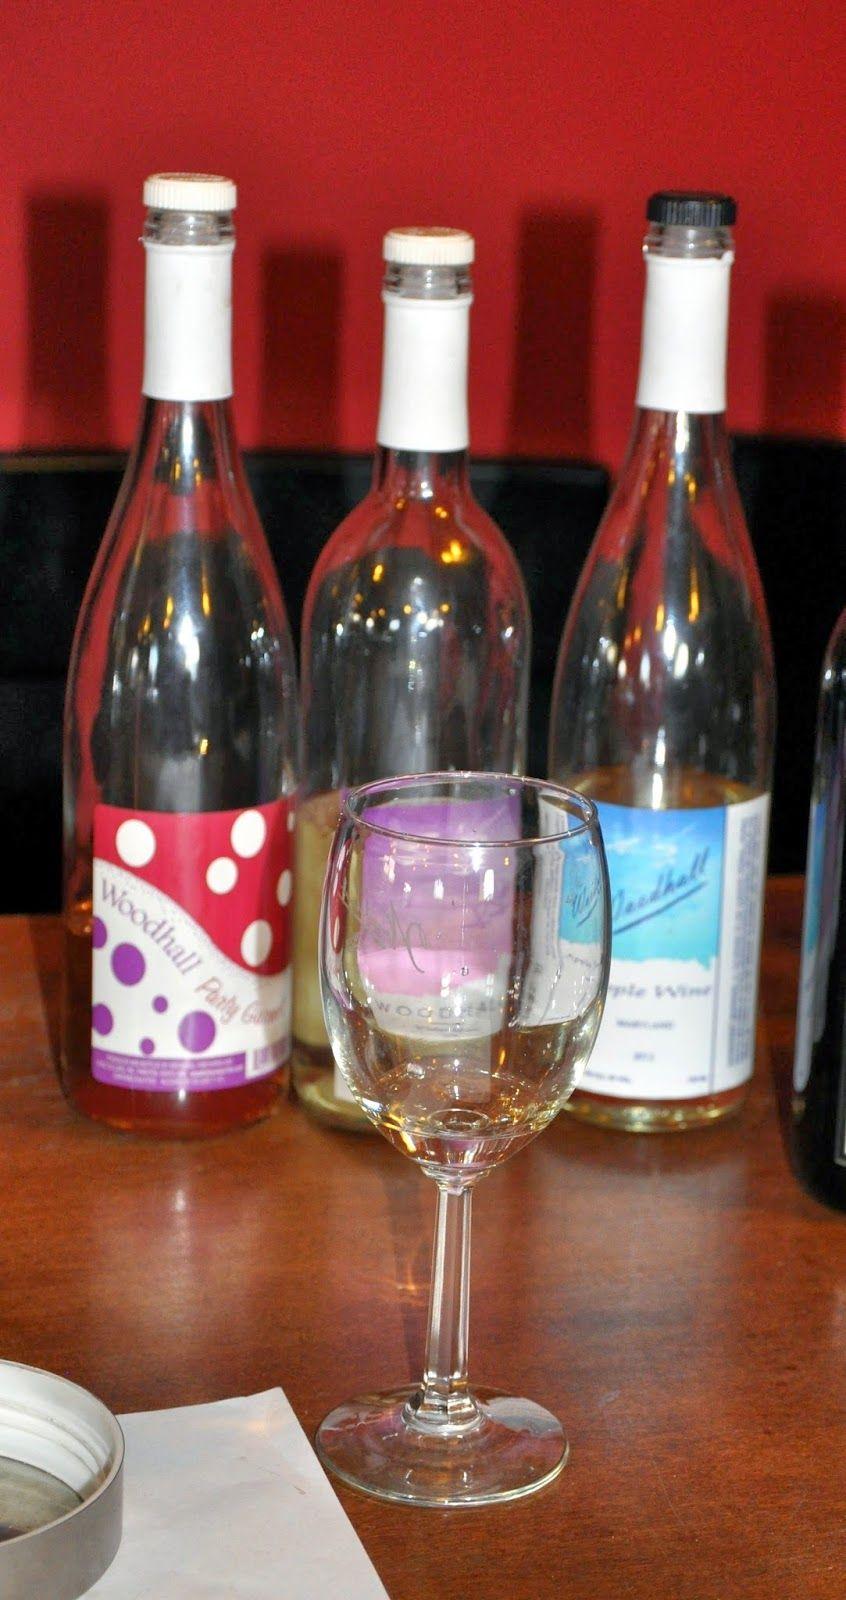 Serpent Ridge Winery Basignani Winery Woodhall Winecellars Winery Hard Cider Wine